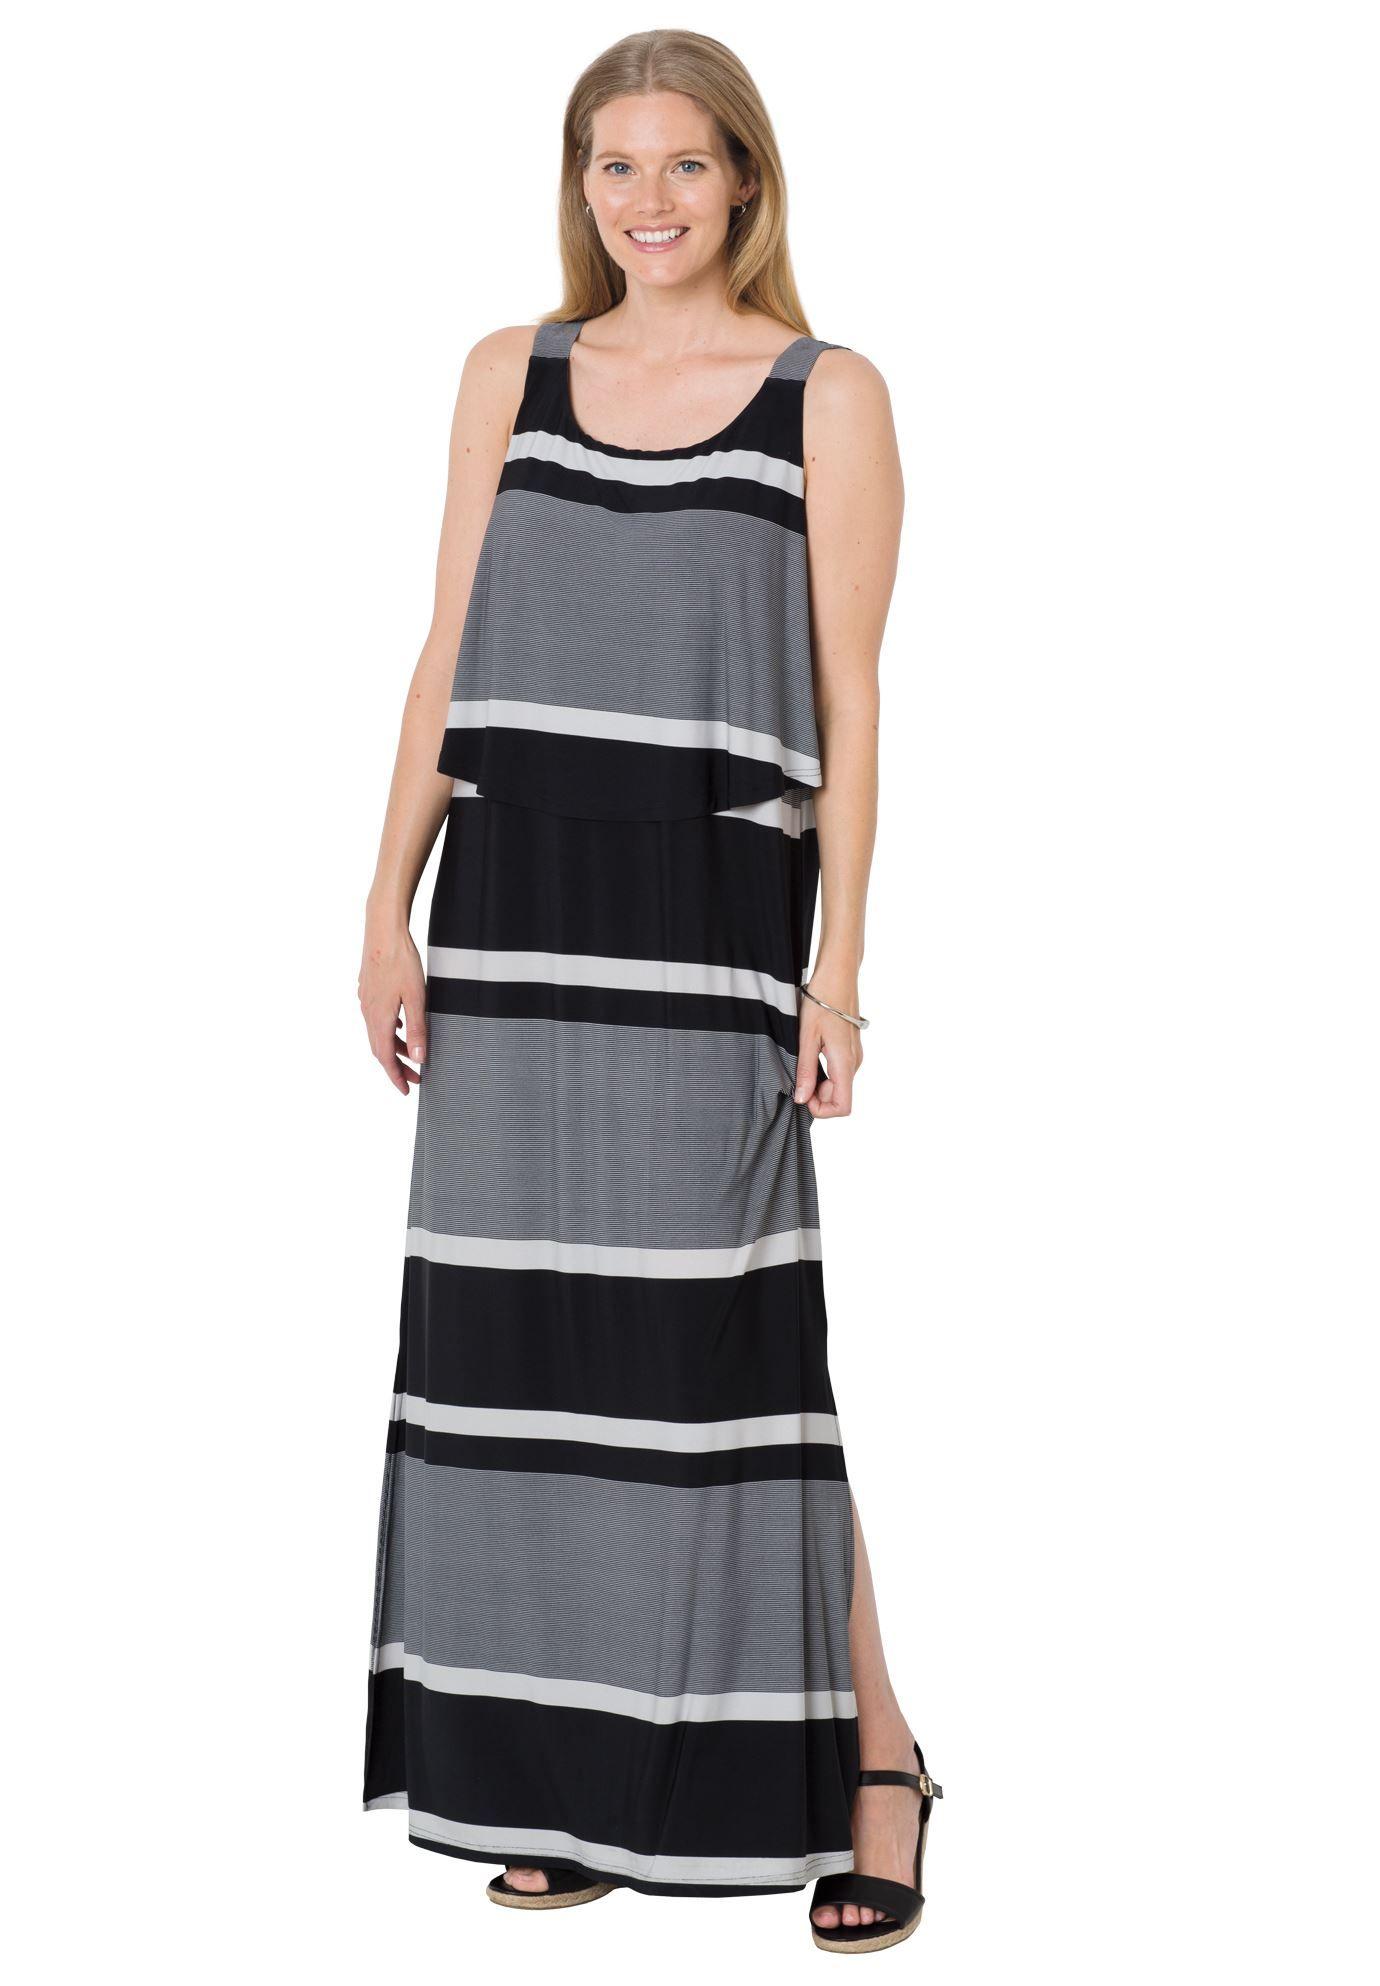 Maxi Popover Dress Clothes For Women Plus Size Maxi Dresses Clothes [ 1986 x 1380 Pixel ]